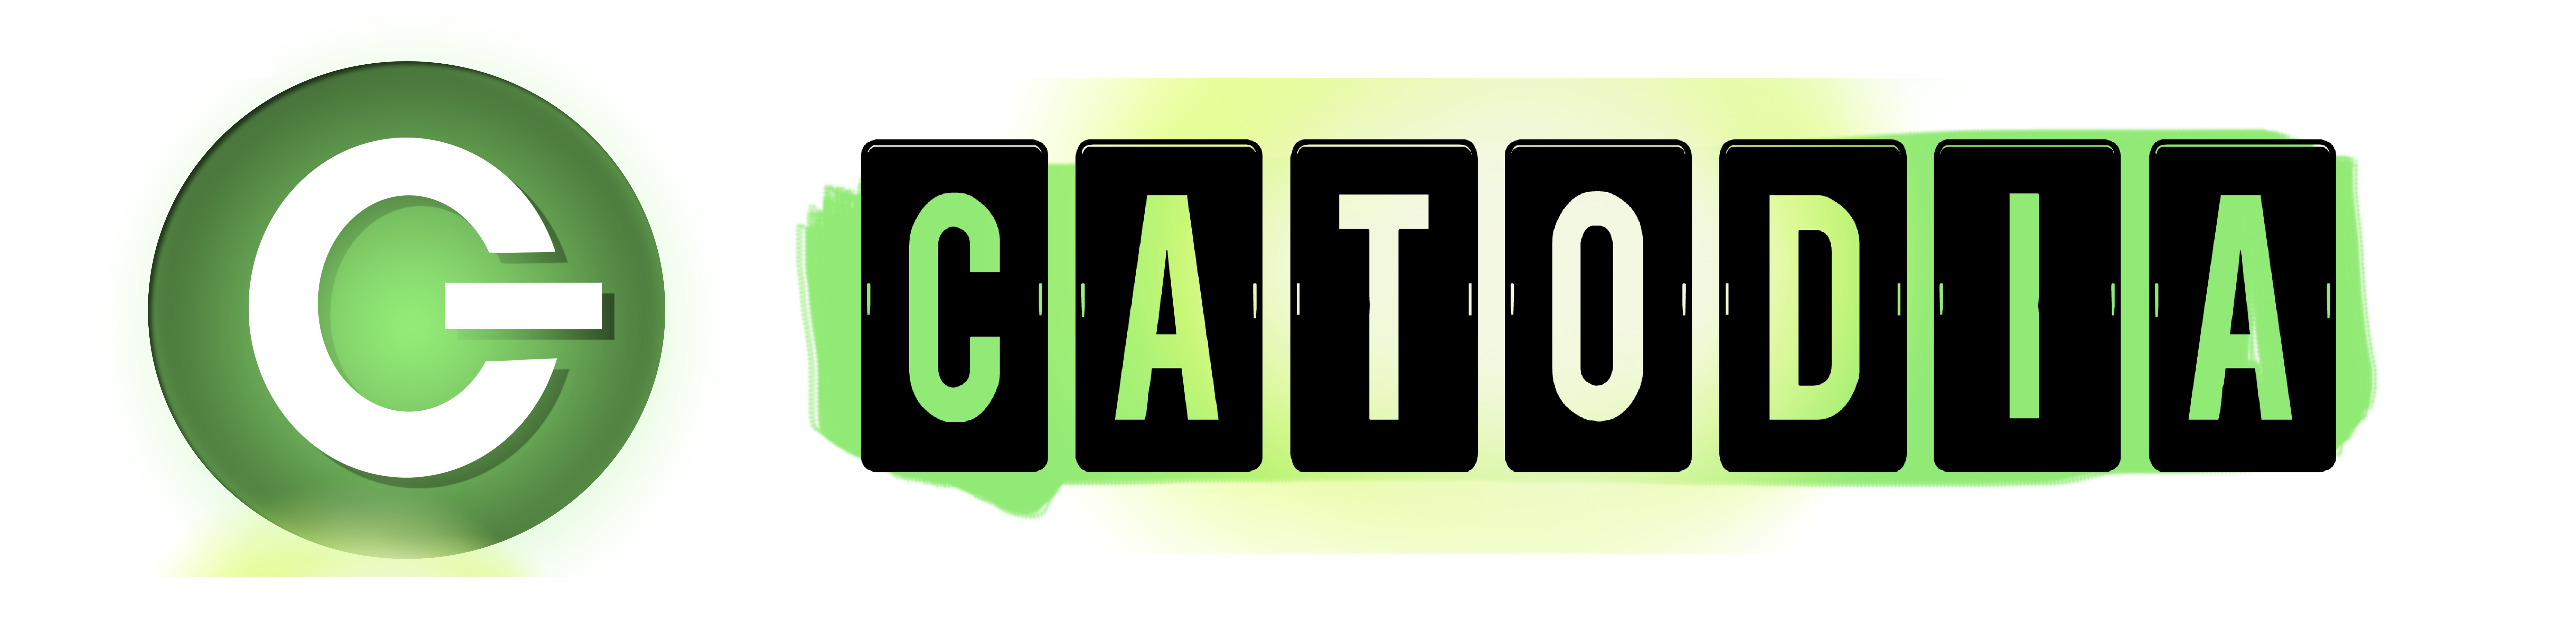 Catodia Podcast